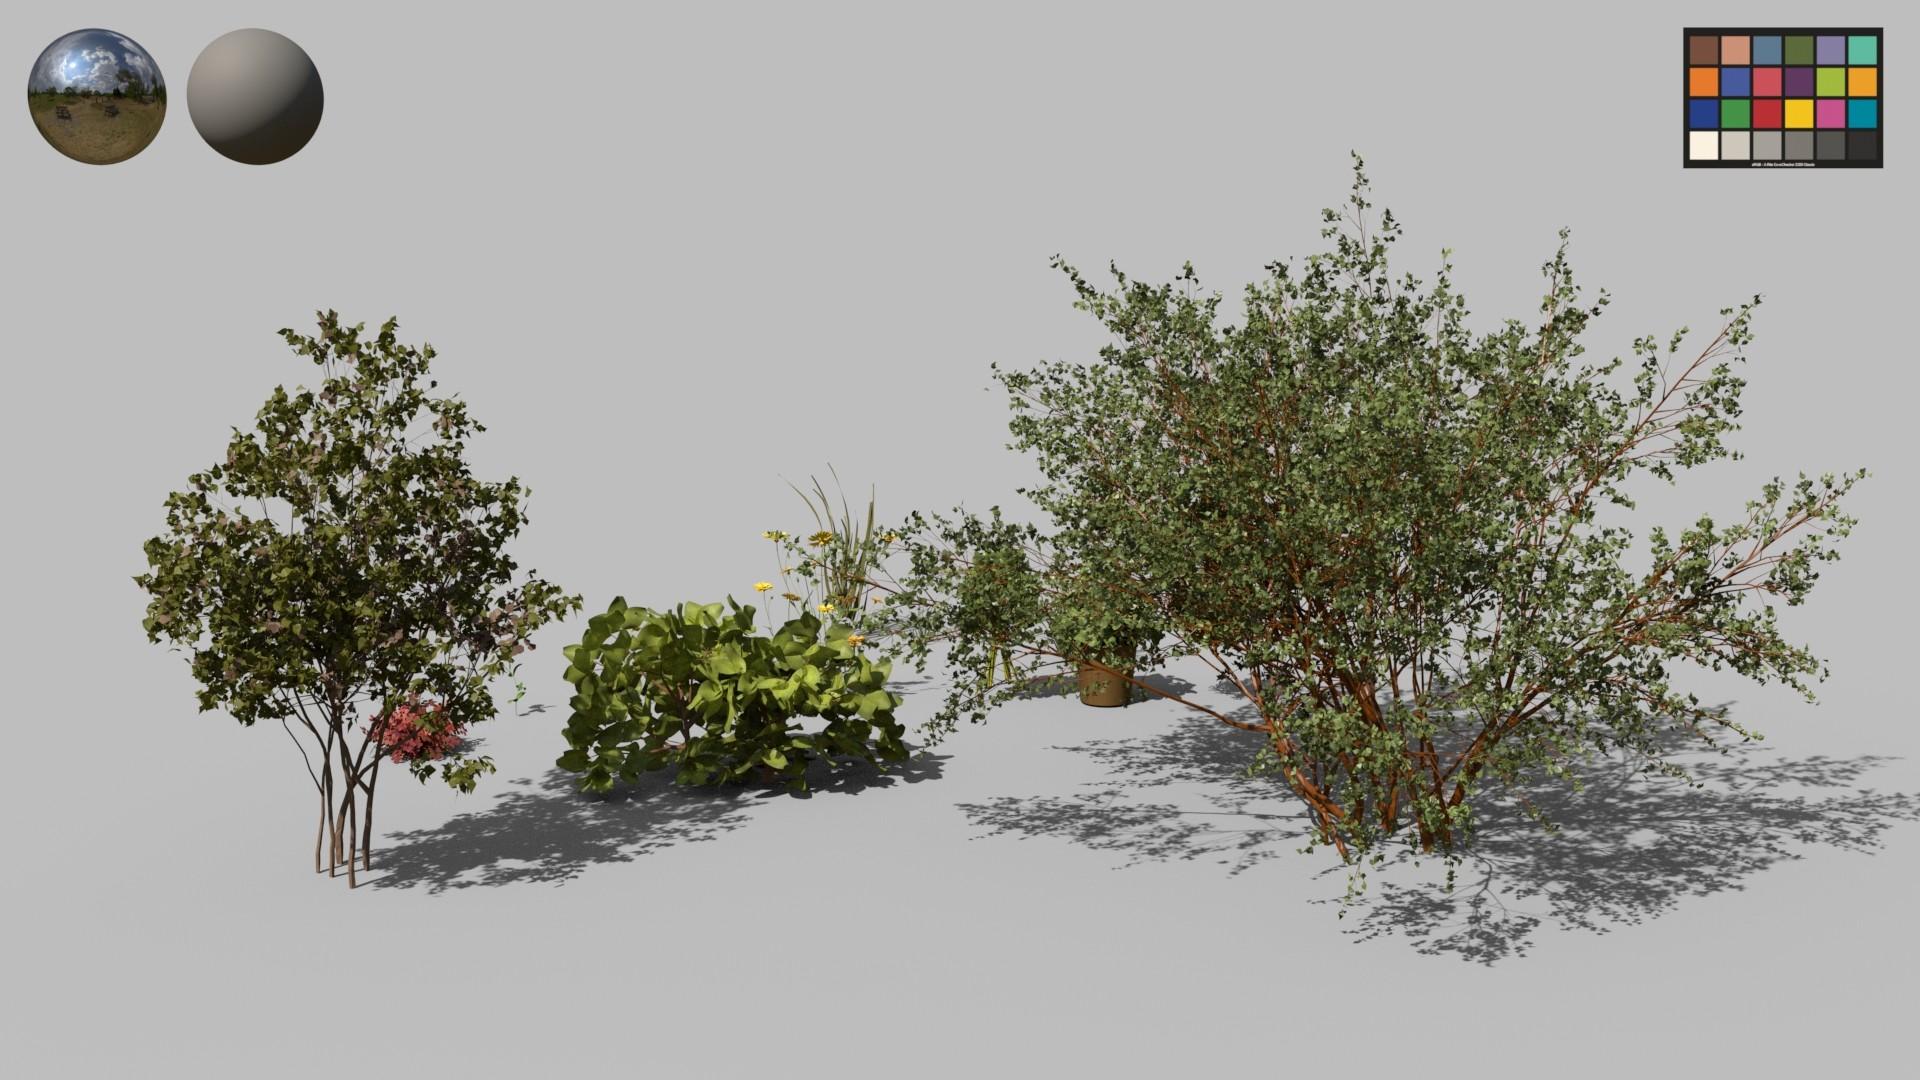 ArtStation - Hobbit House - VFX project, Susanne Bloch Olsen